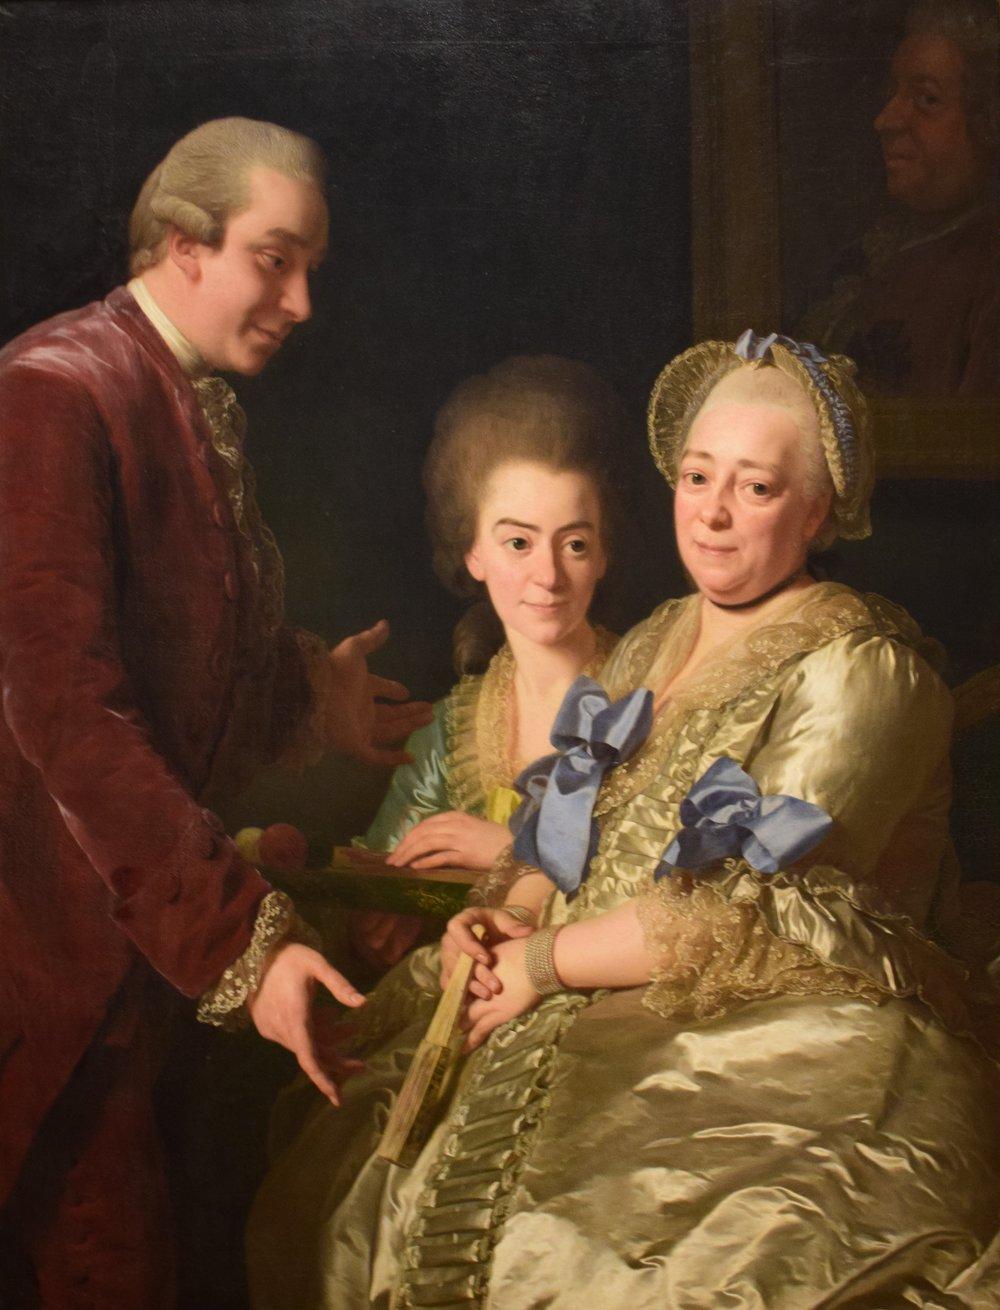 Alexander Roslin, Änkefru Anna Johanna Grill med son och dotter (The Widow Anna Johanna Grill with Son and Daughter), 1775